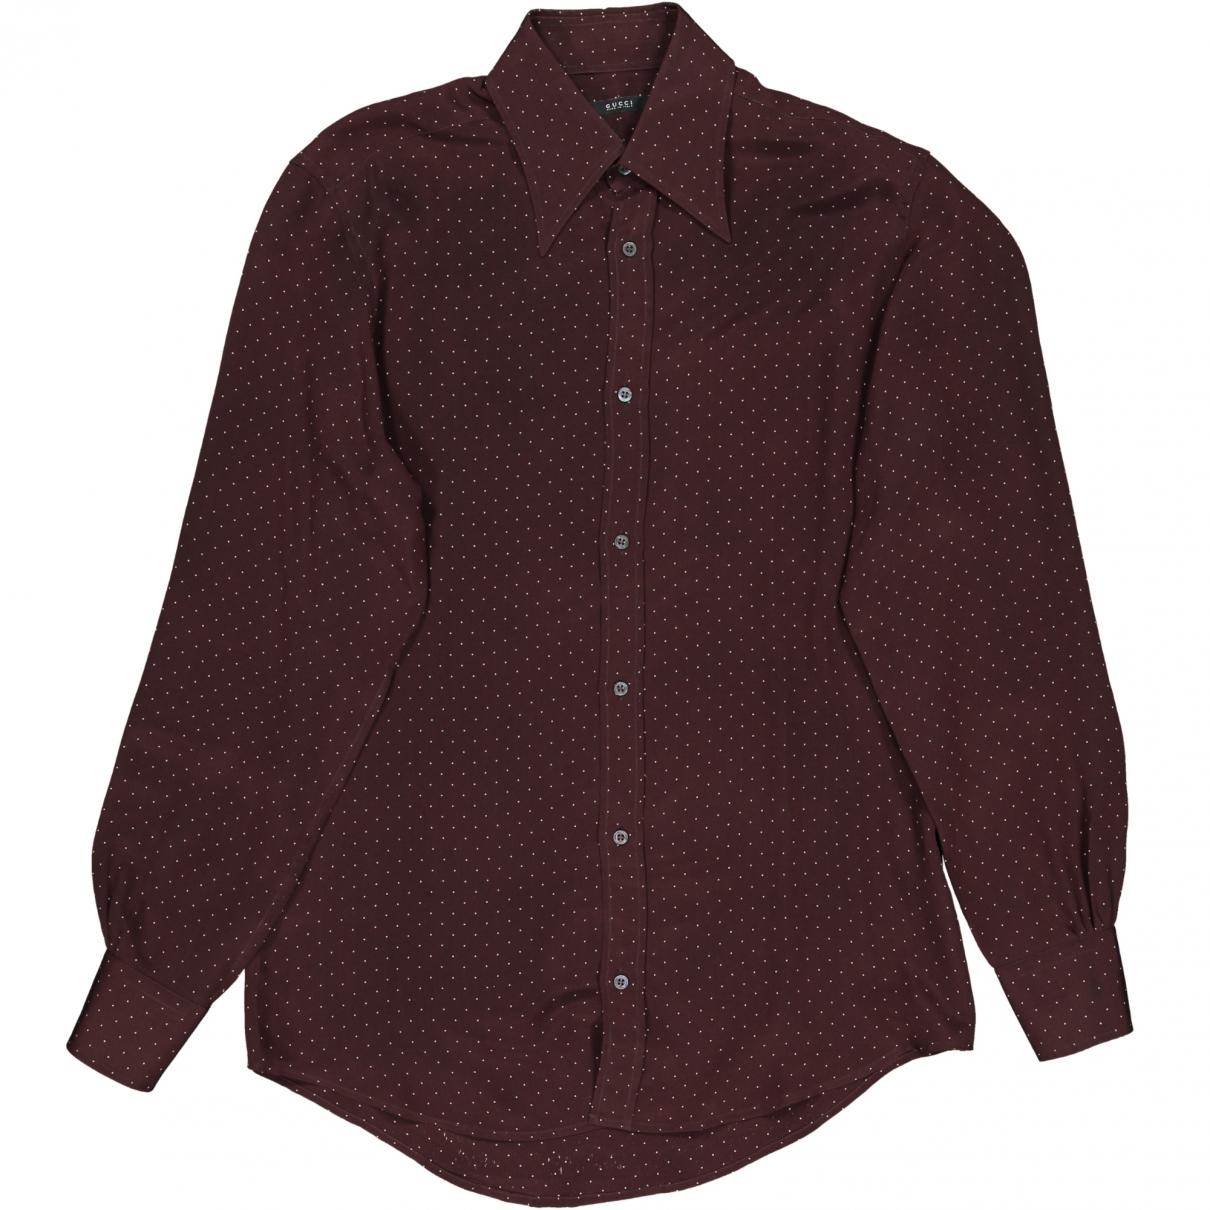 Gucci \N Brown Silk Shirts for Men 38 EU (tour de cou / collar)